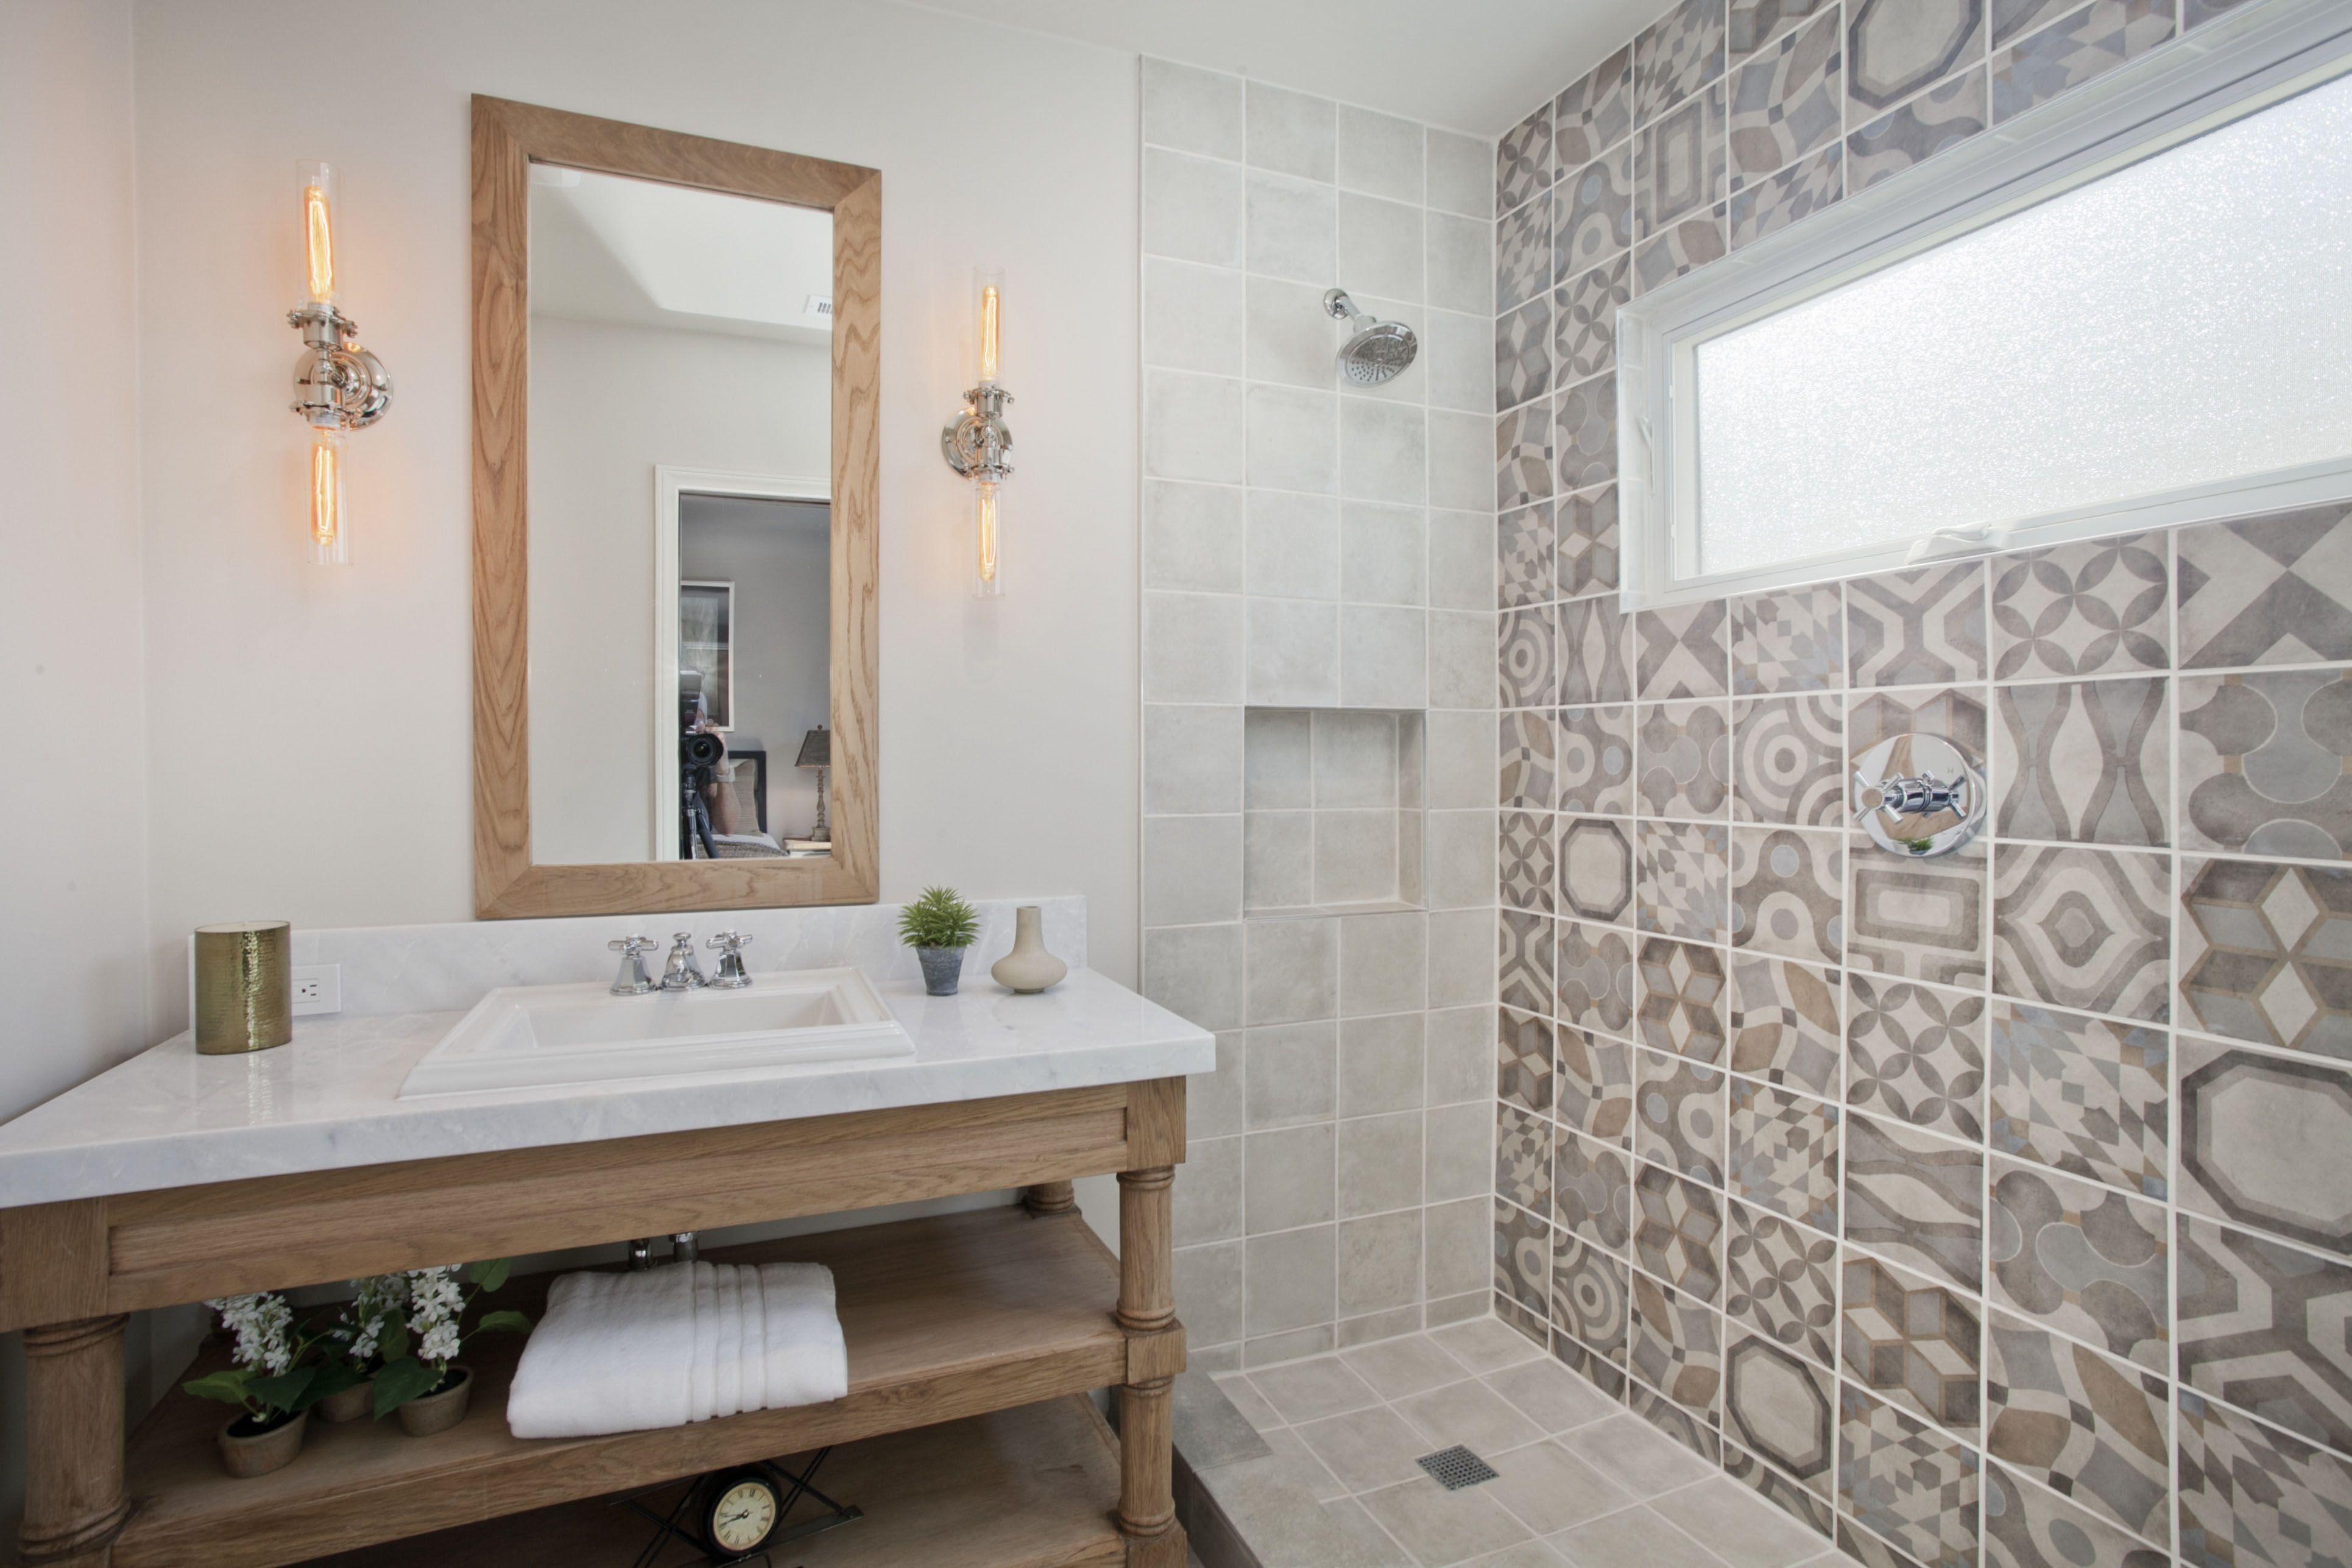 Bagno Bathrooms ~ Memory of cerim www.imptile.com bathroom tile pinterest